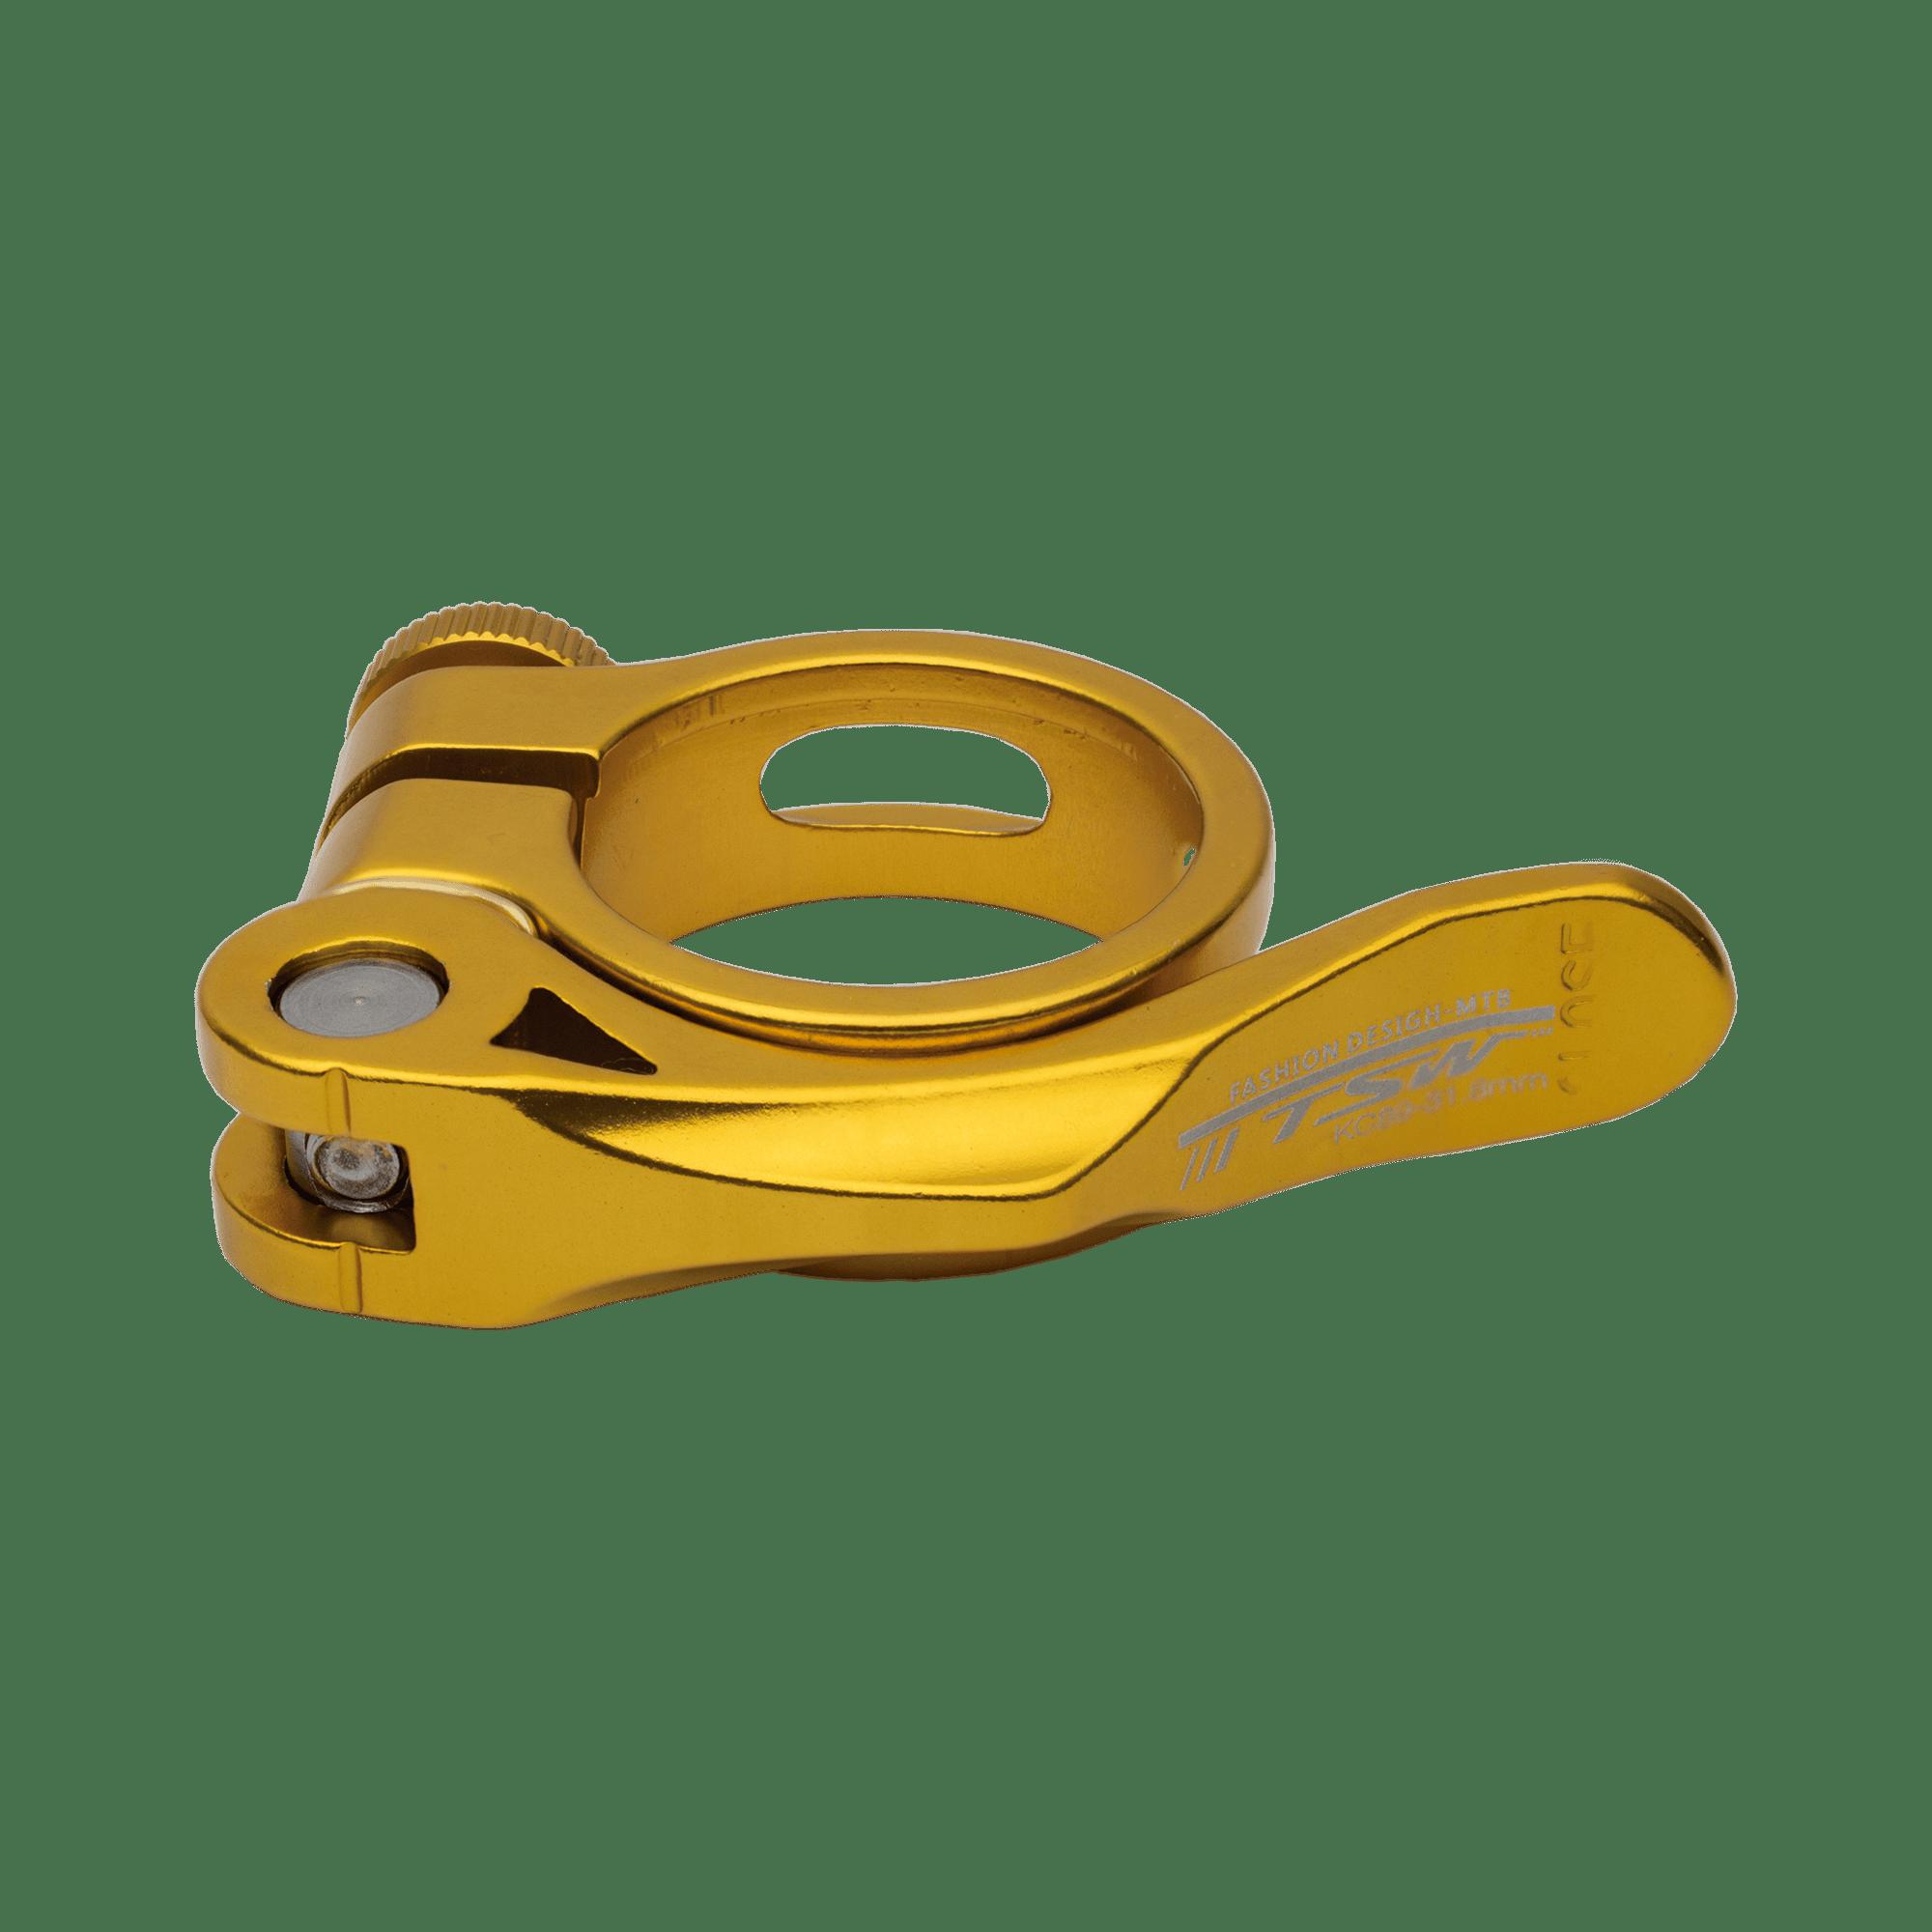 Abraçadeira de selim vazada - MTB 4